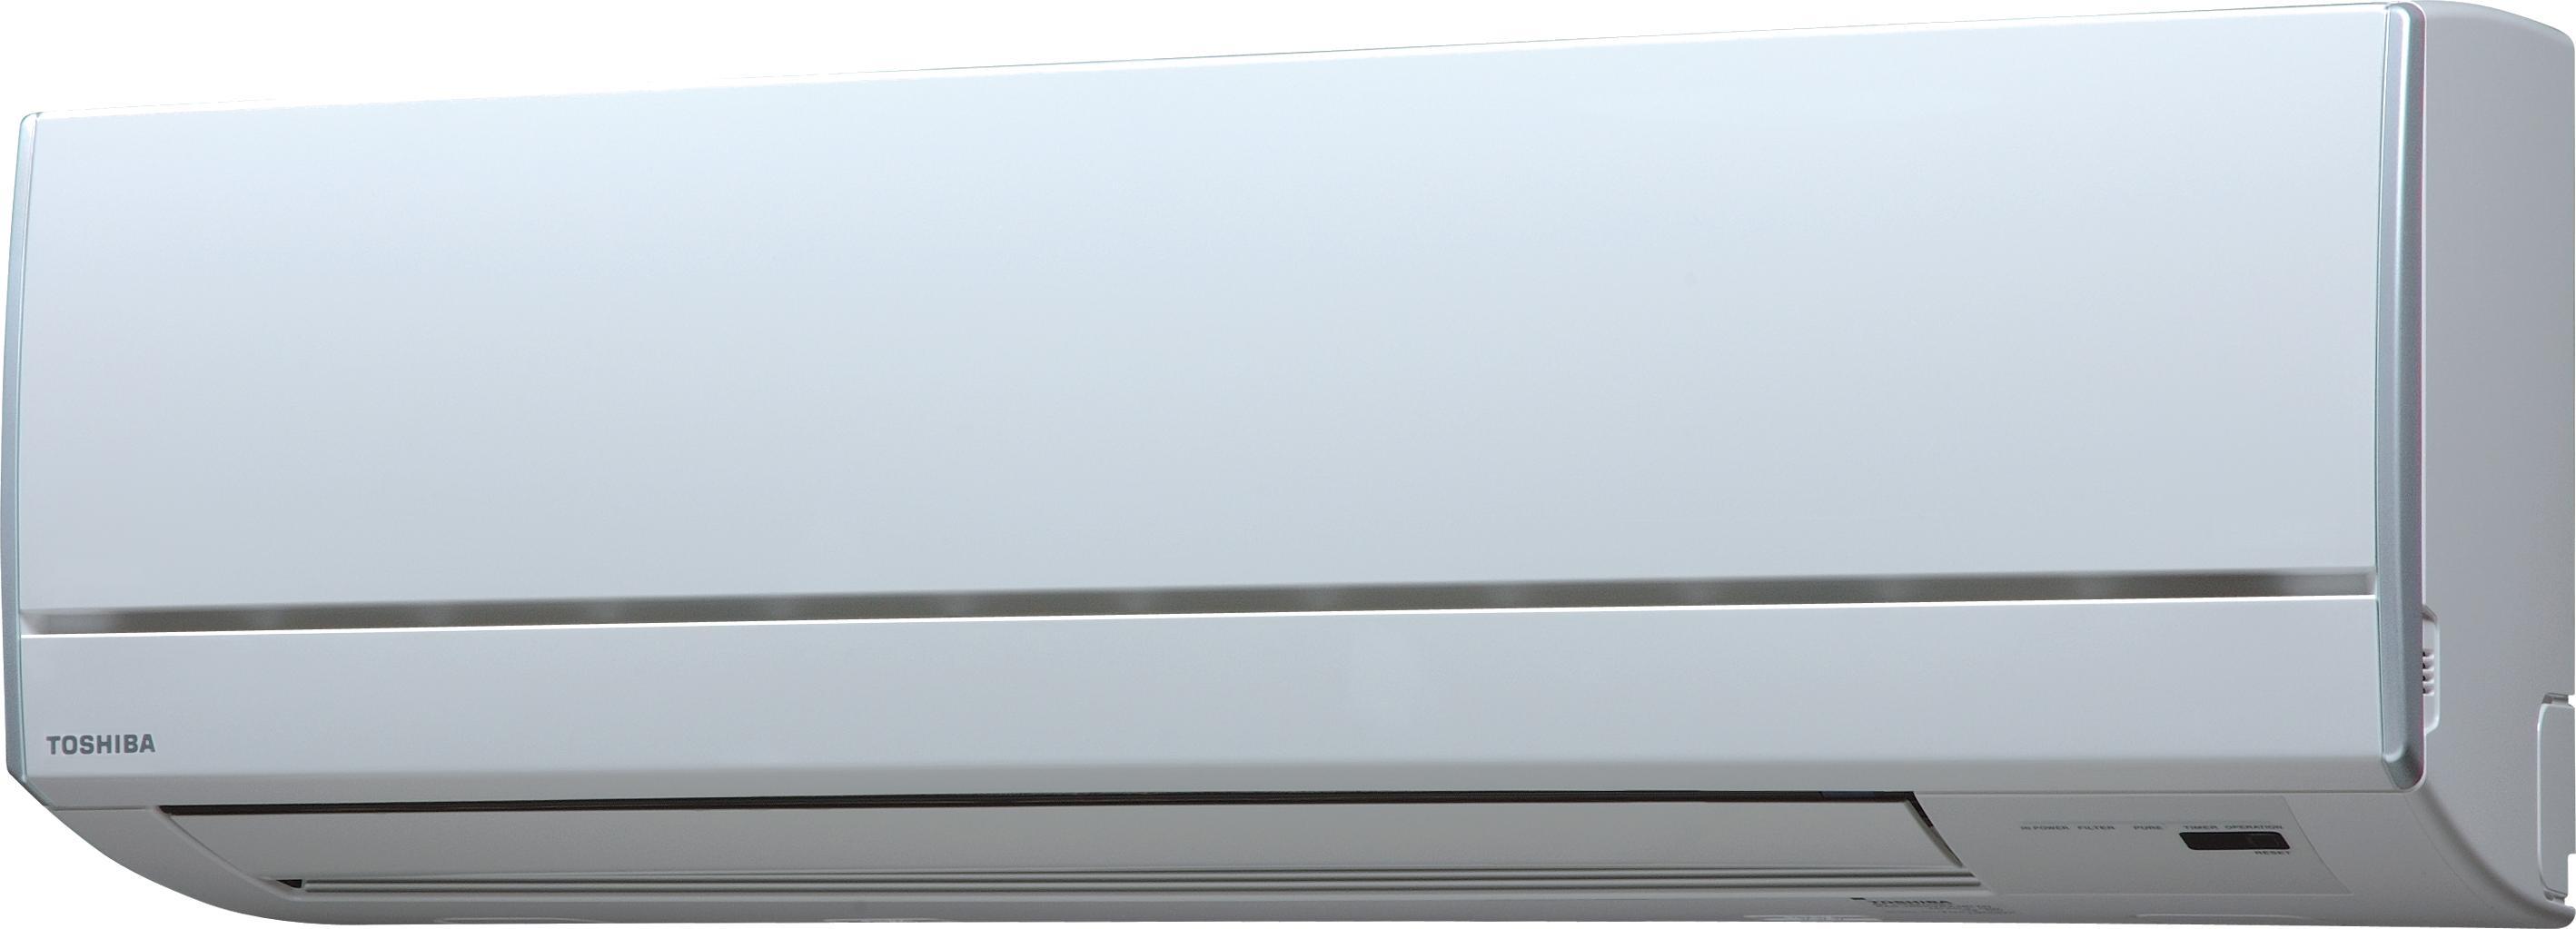 Toshiba RAS-10SKP-ES